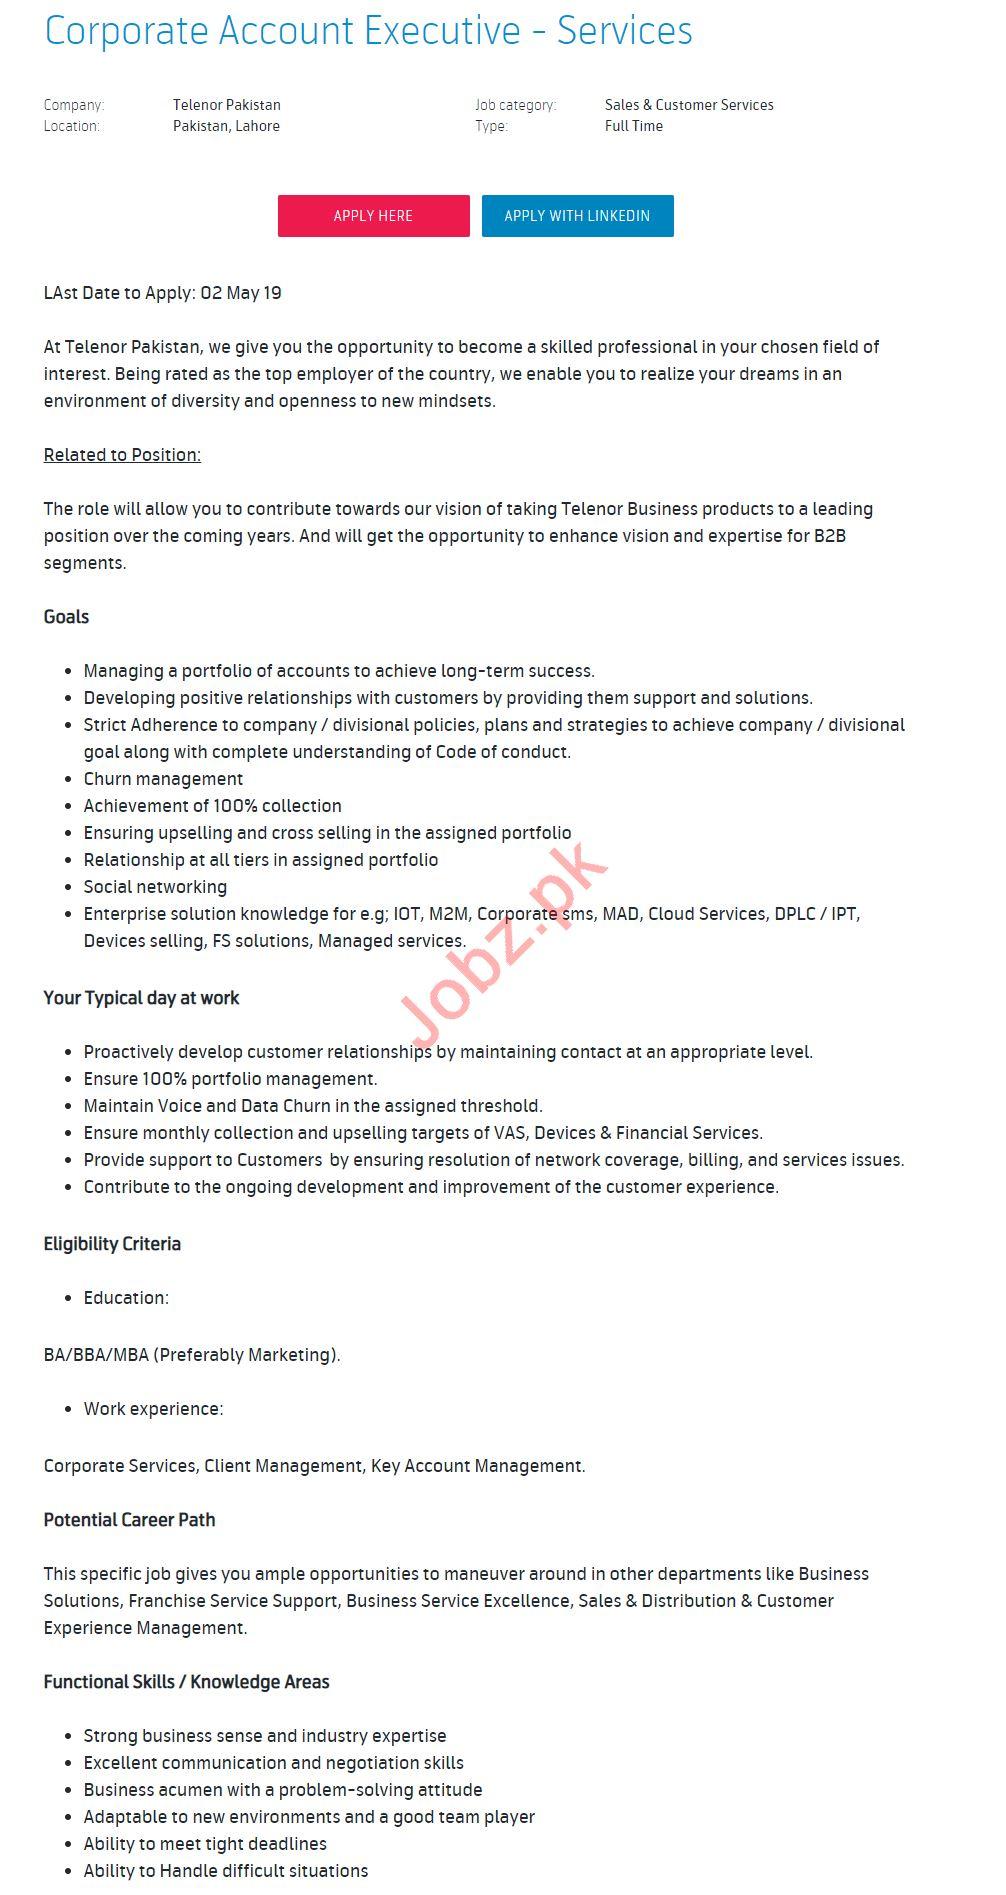 Telenor Pakistan Jobs 2019 for Corporate Account Executive